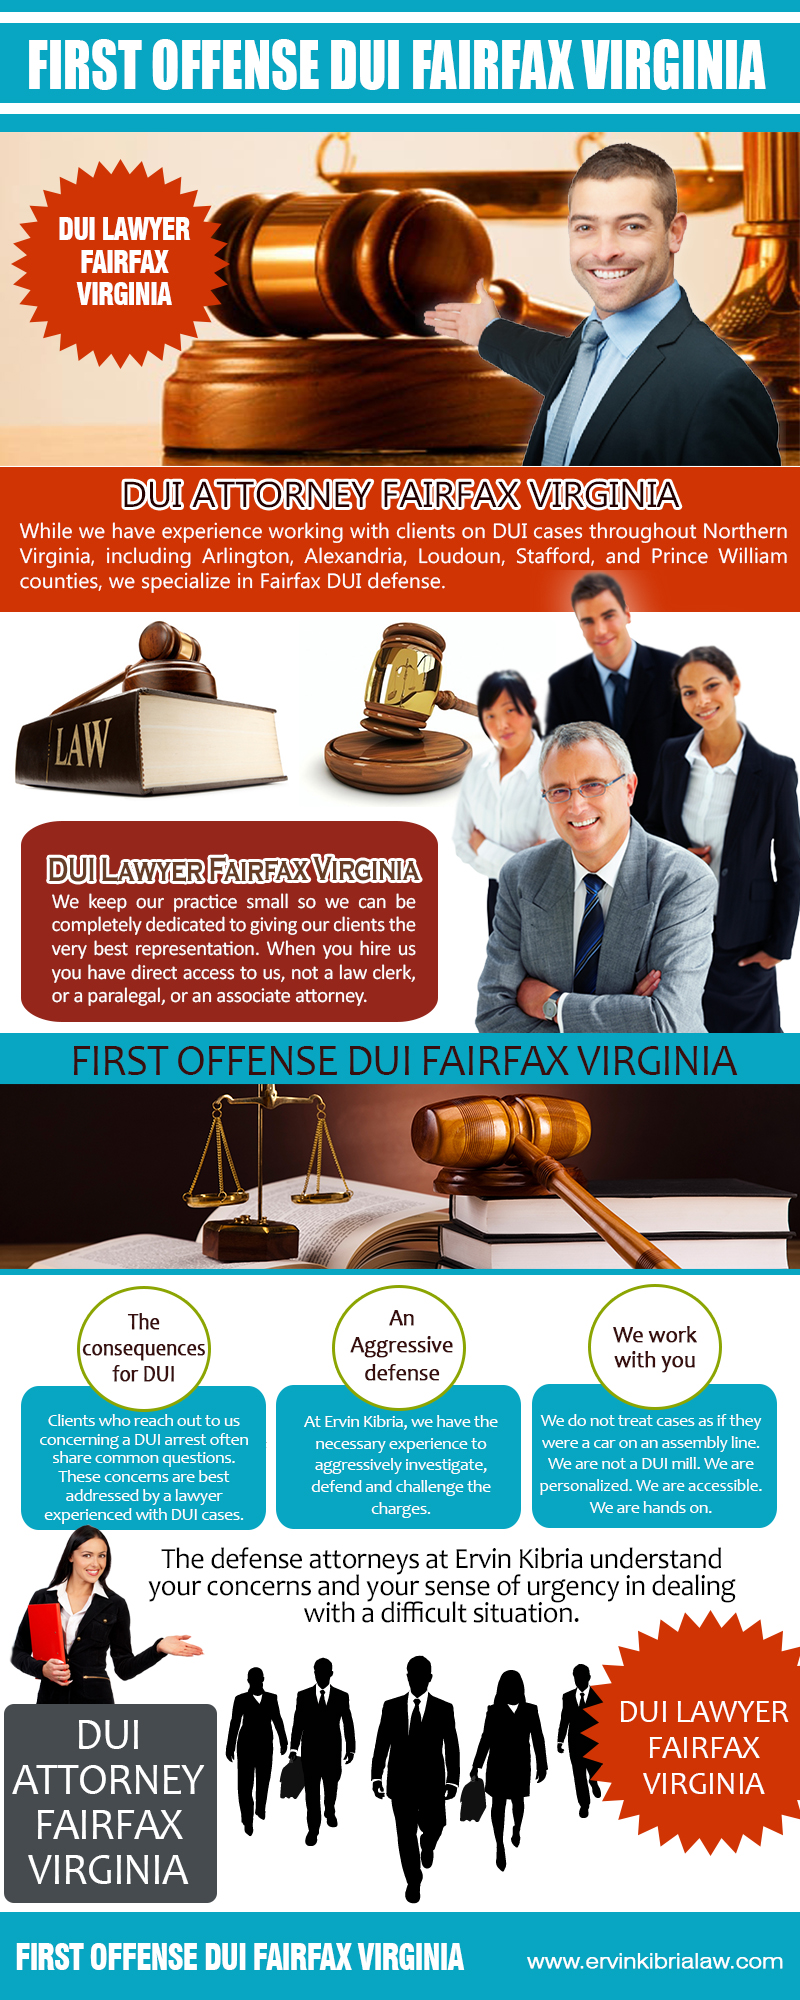 First Offense DUI Fairfax Virginia